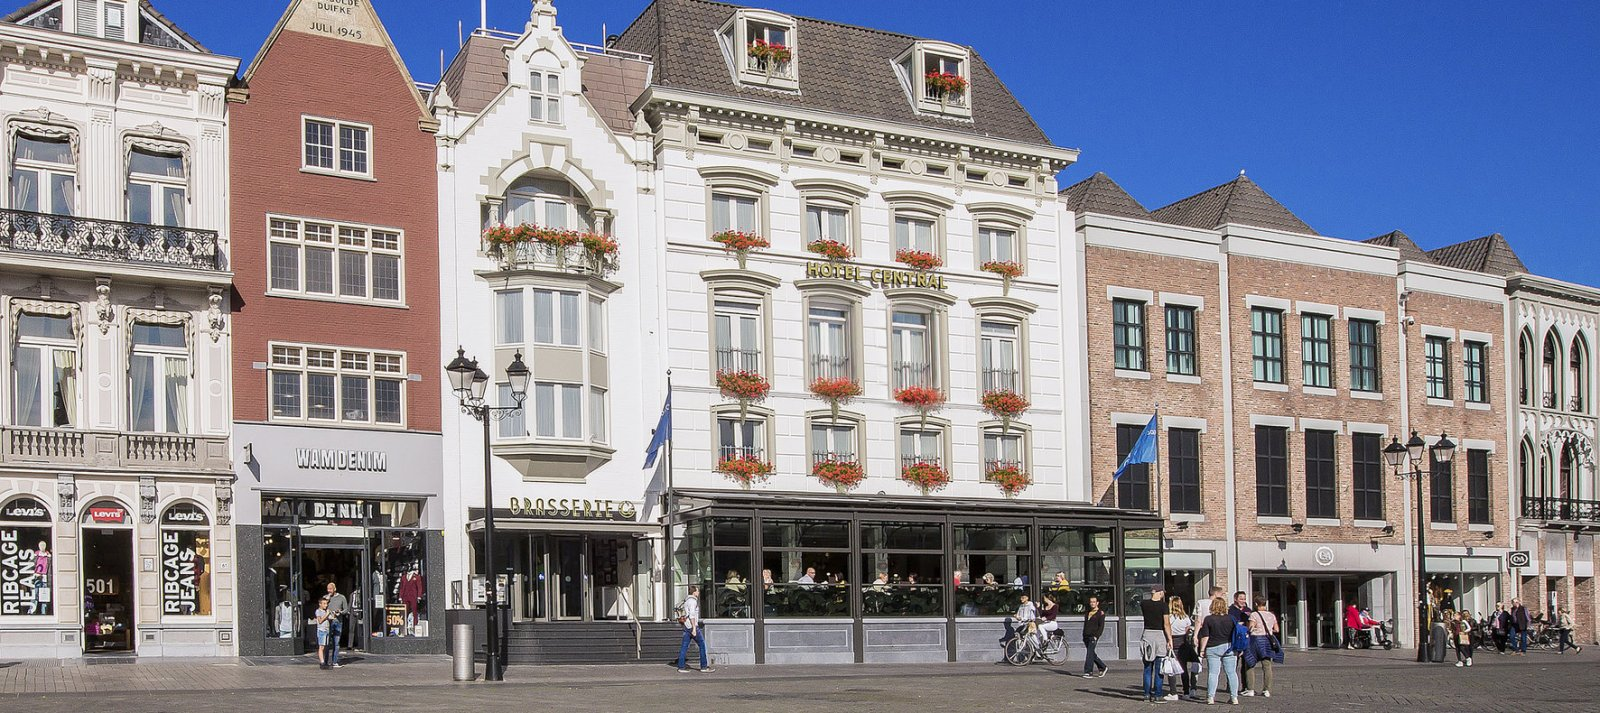 hotelindenbosch.nl